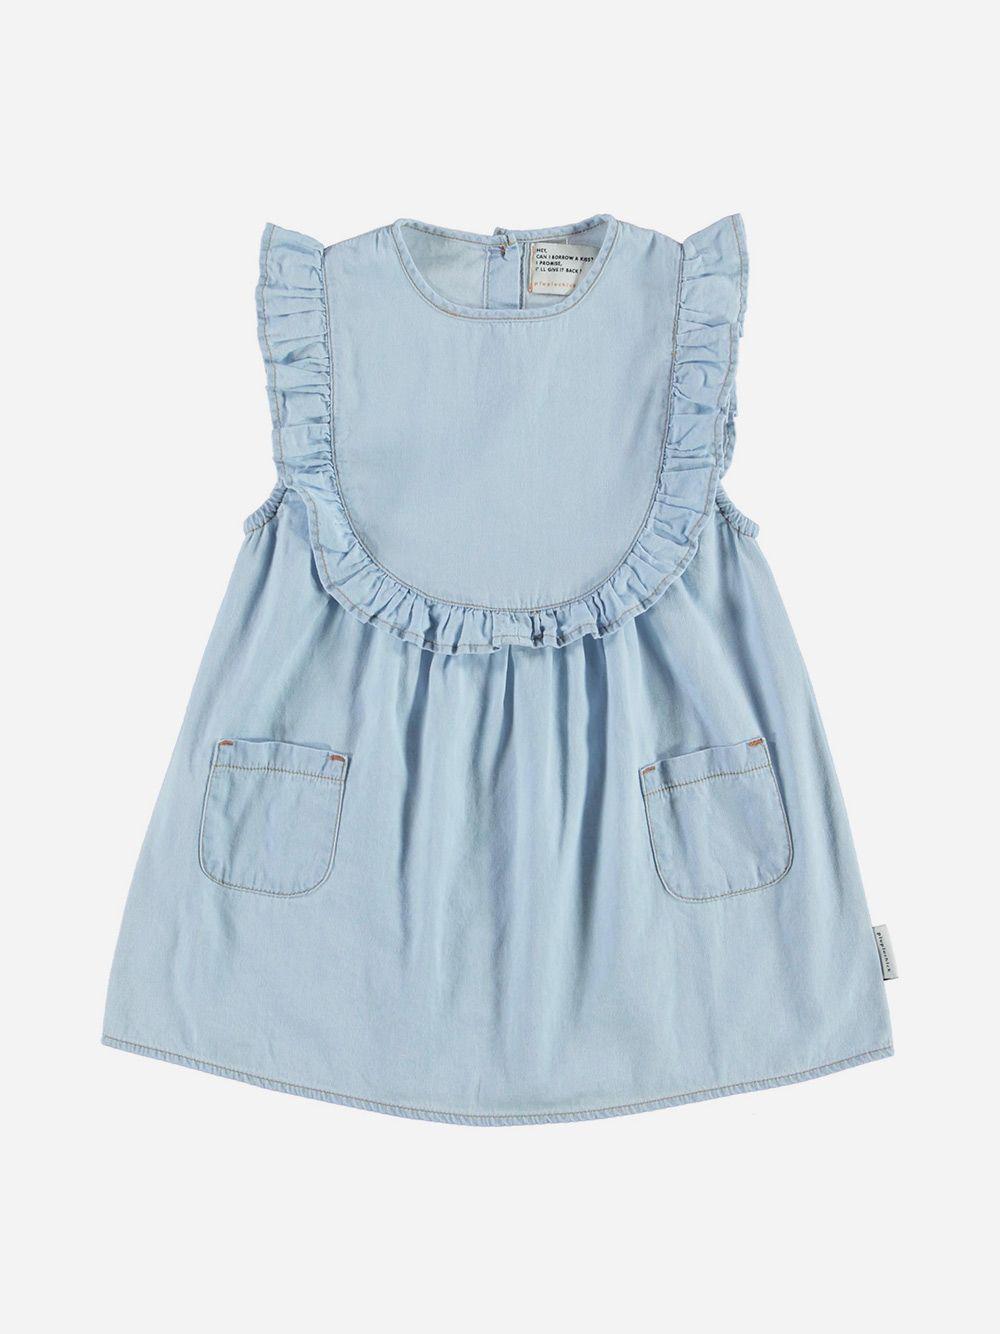 Short Dress with Frill Light blue Denim